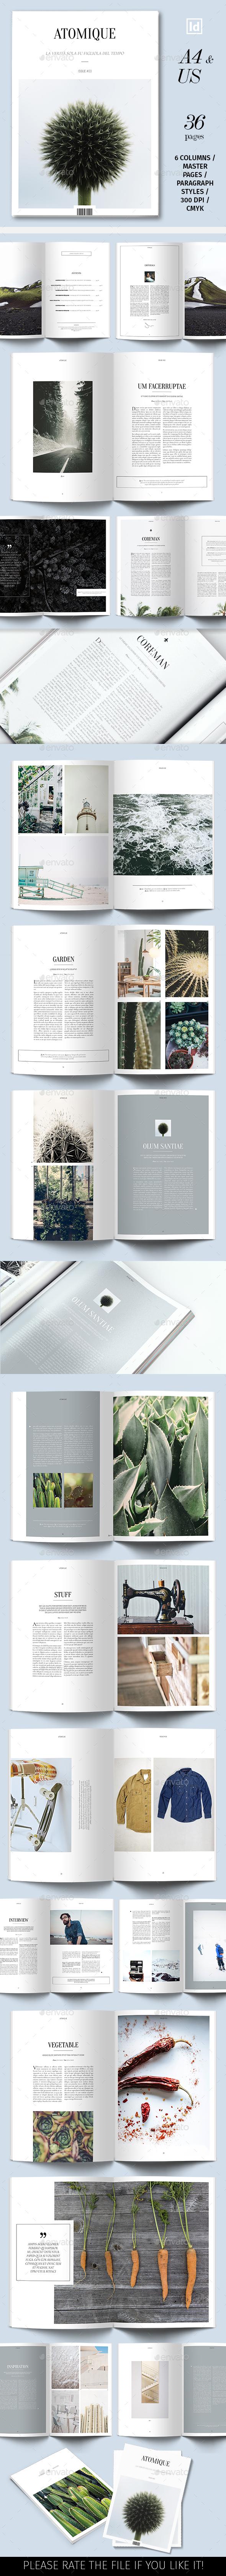 Atomique Magazine Template - Magazines Print Templates